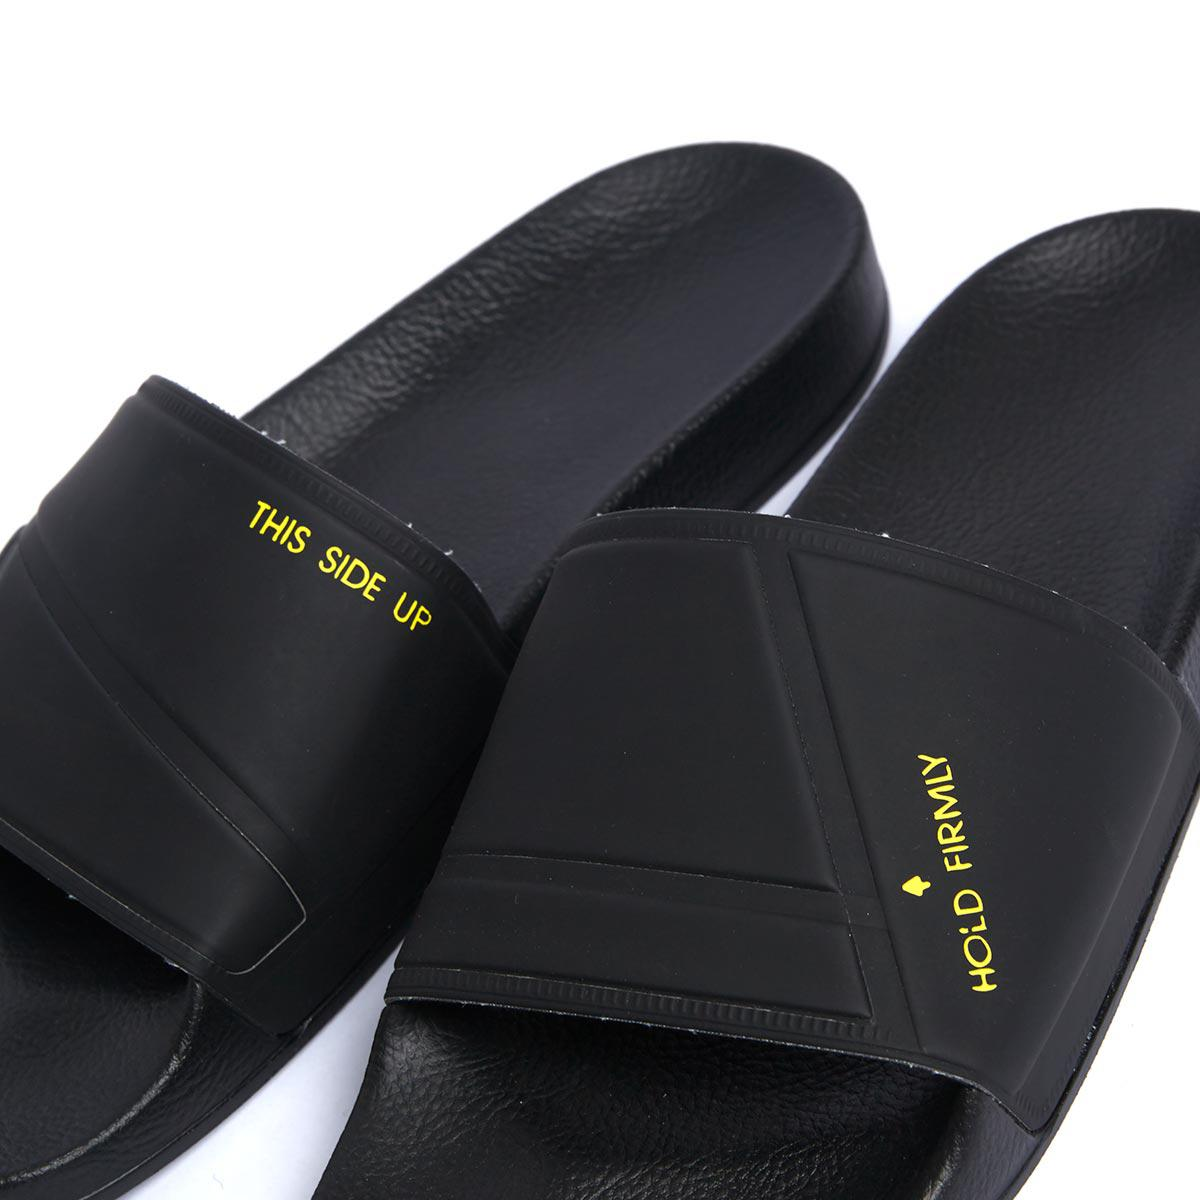 0e19fe03ce83 Lyst - adidas By Raf Simons Bunny Adilette Rubber Slides in Black ...